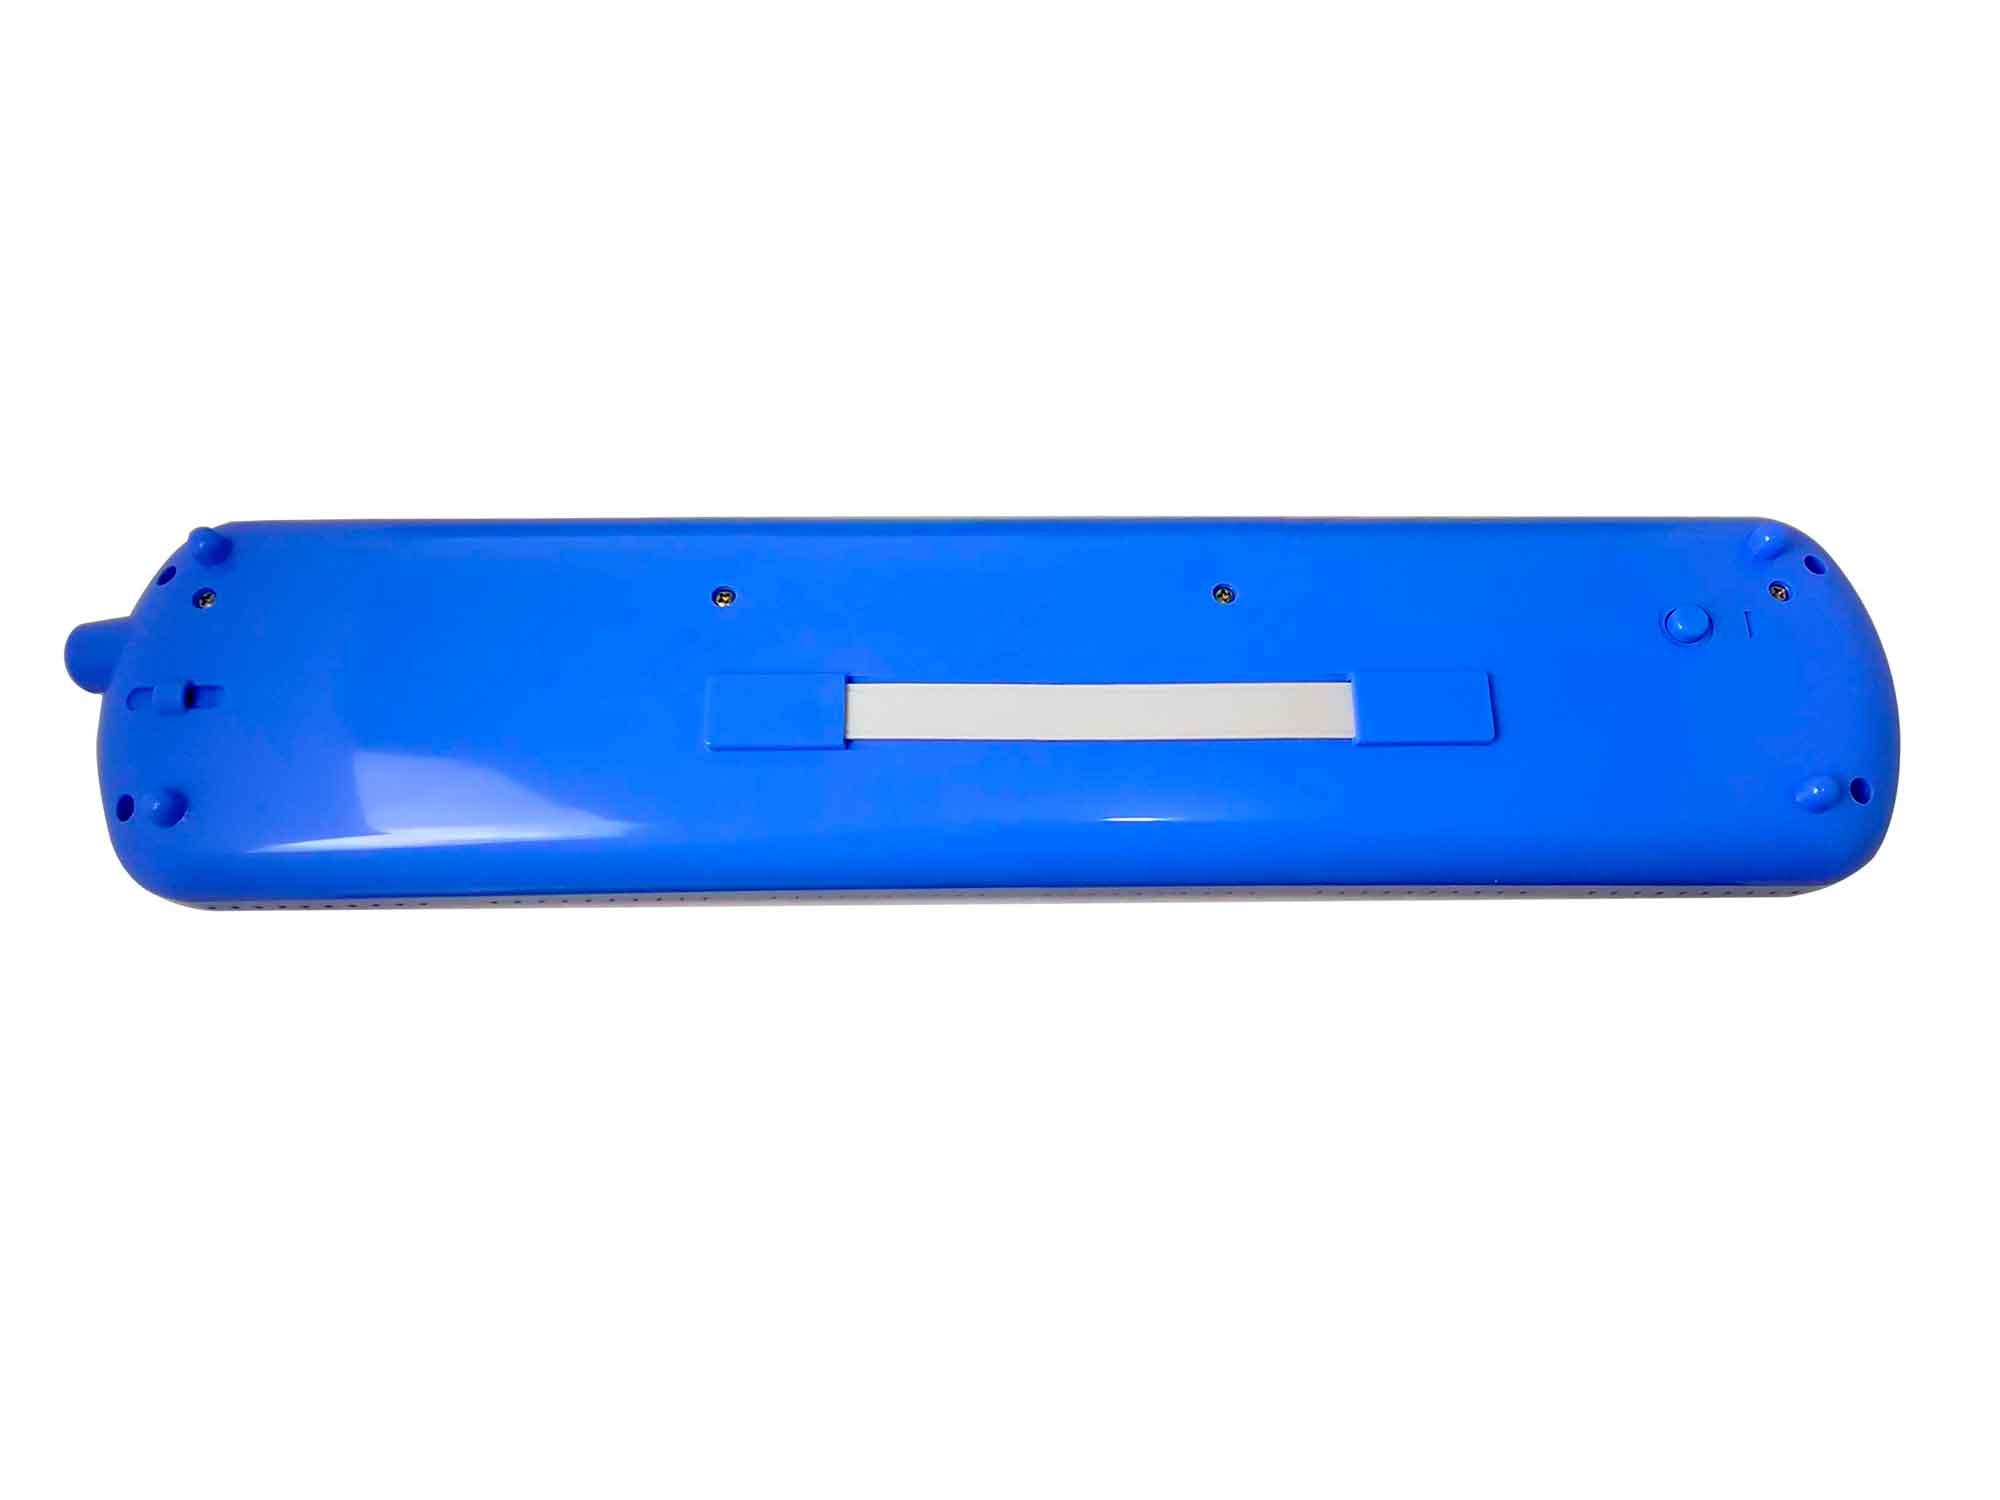 Teclado de sopro, escaleta pianica de 37 teclas com estojo para transporte | CSR | Escaleta 37